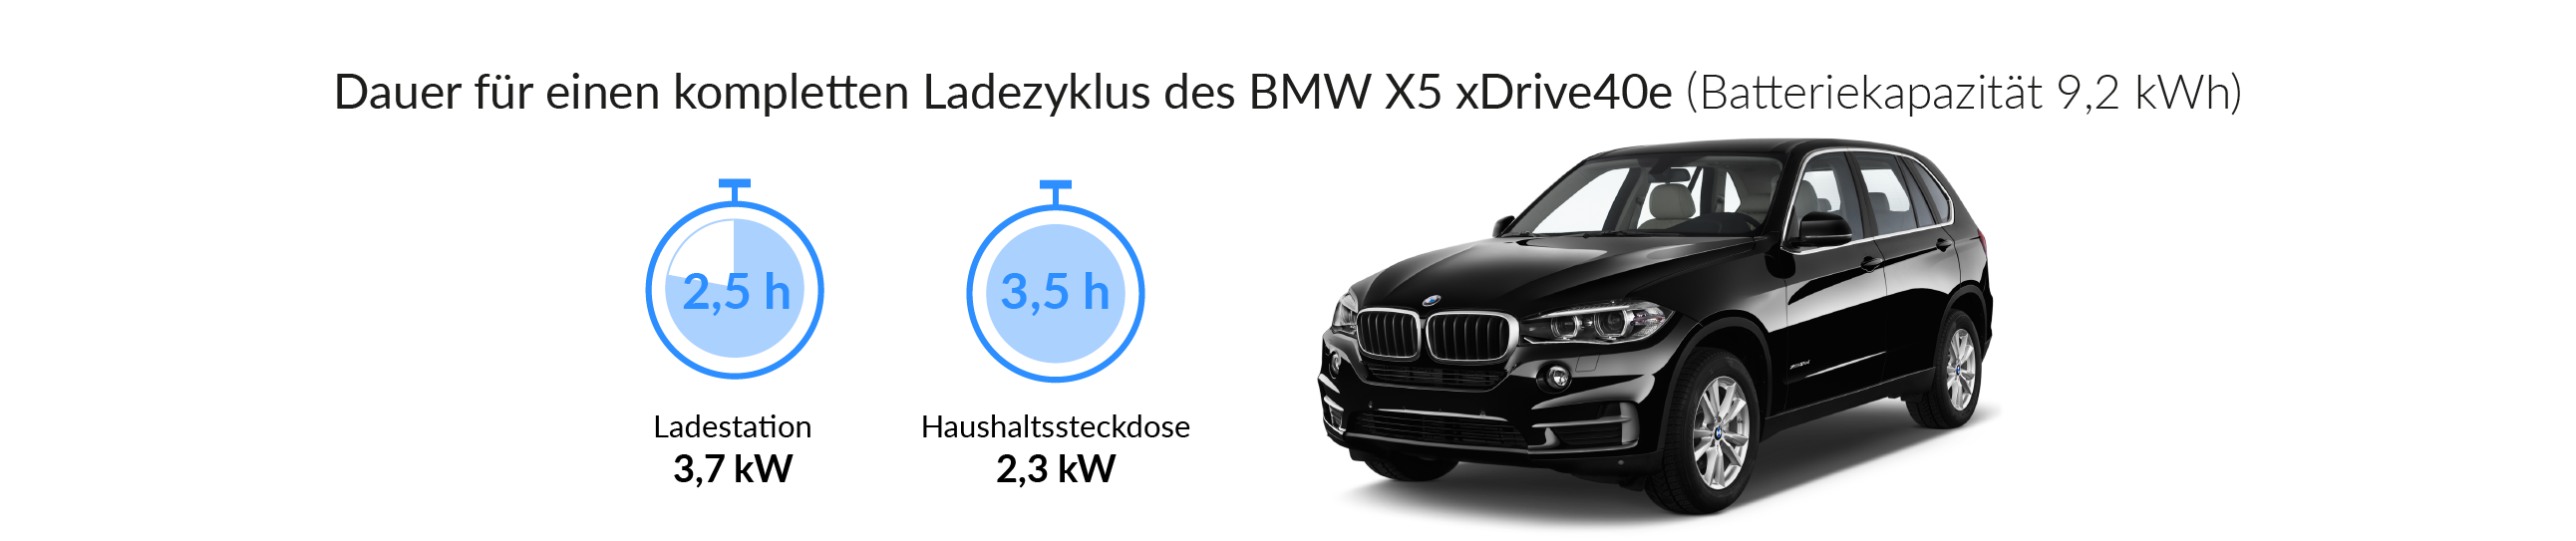 Ladezeiten des BMW X5 xDrive 40e